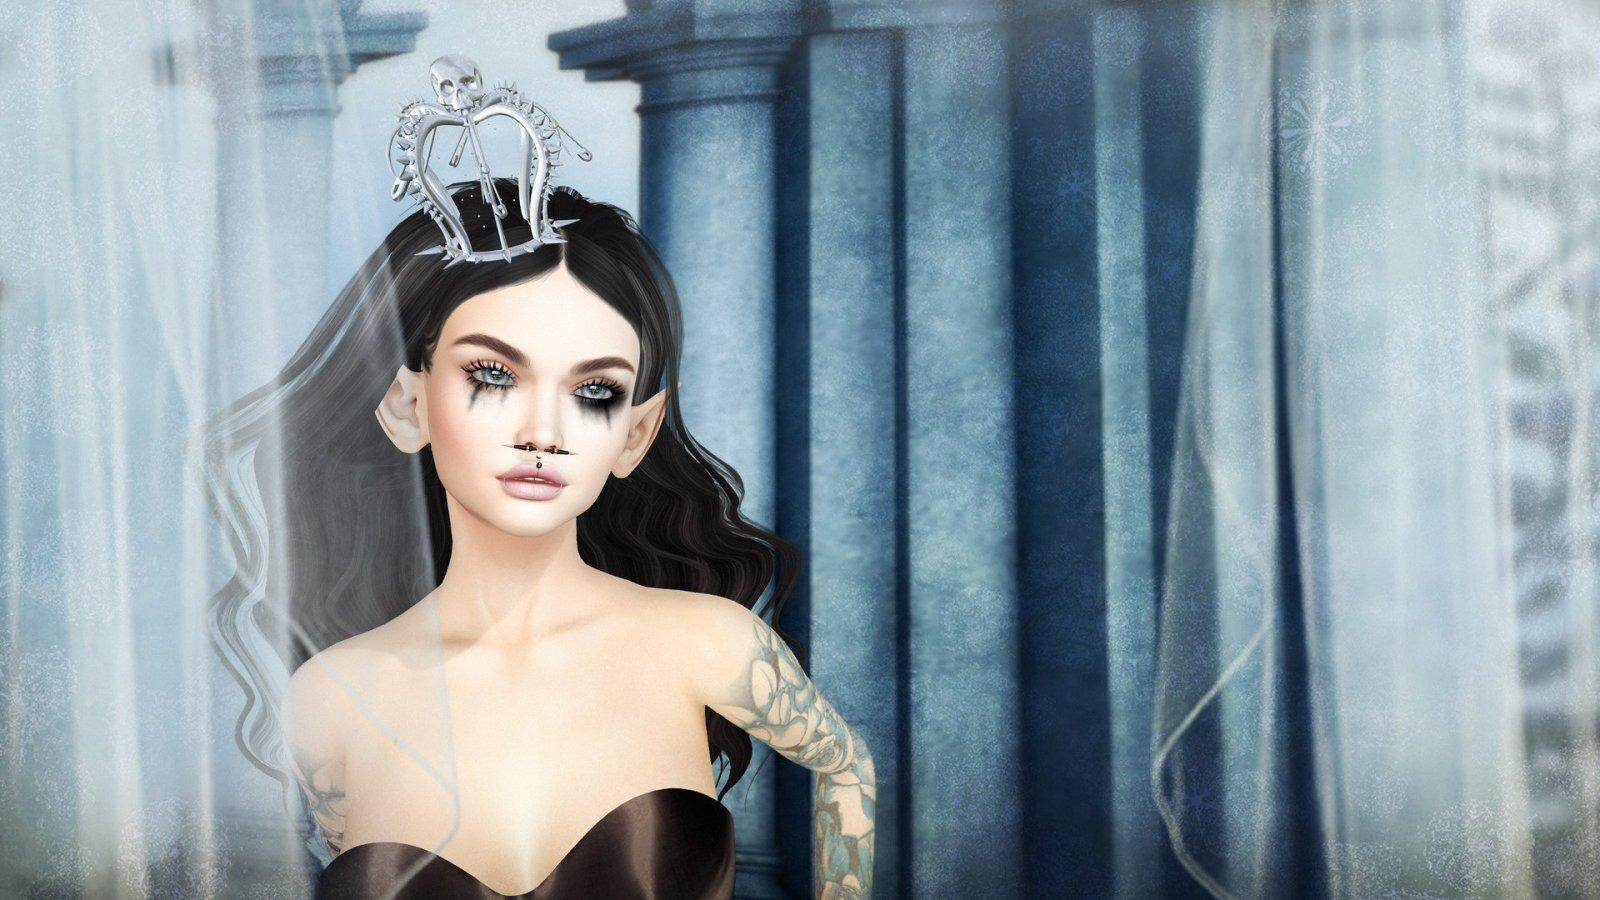 Bish Crown